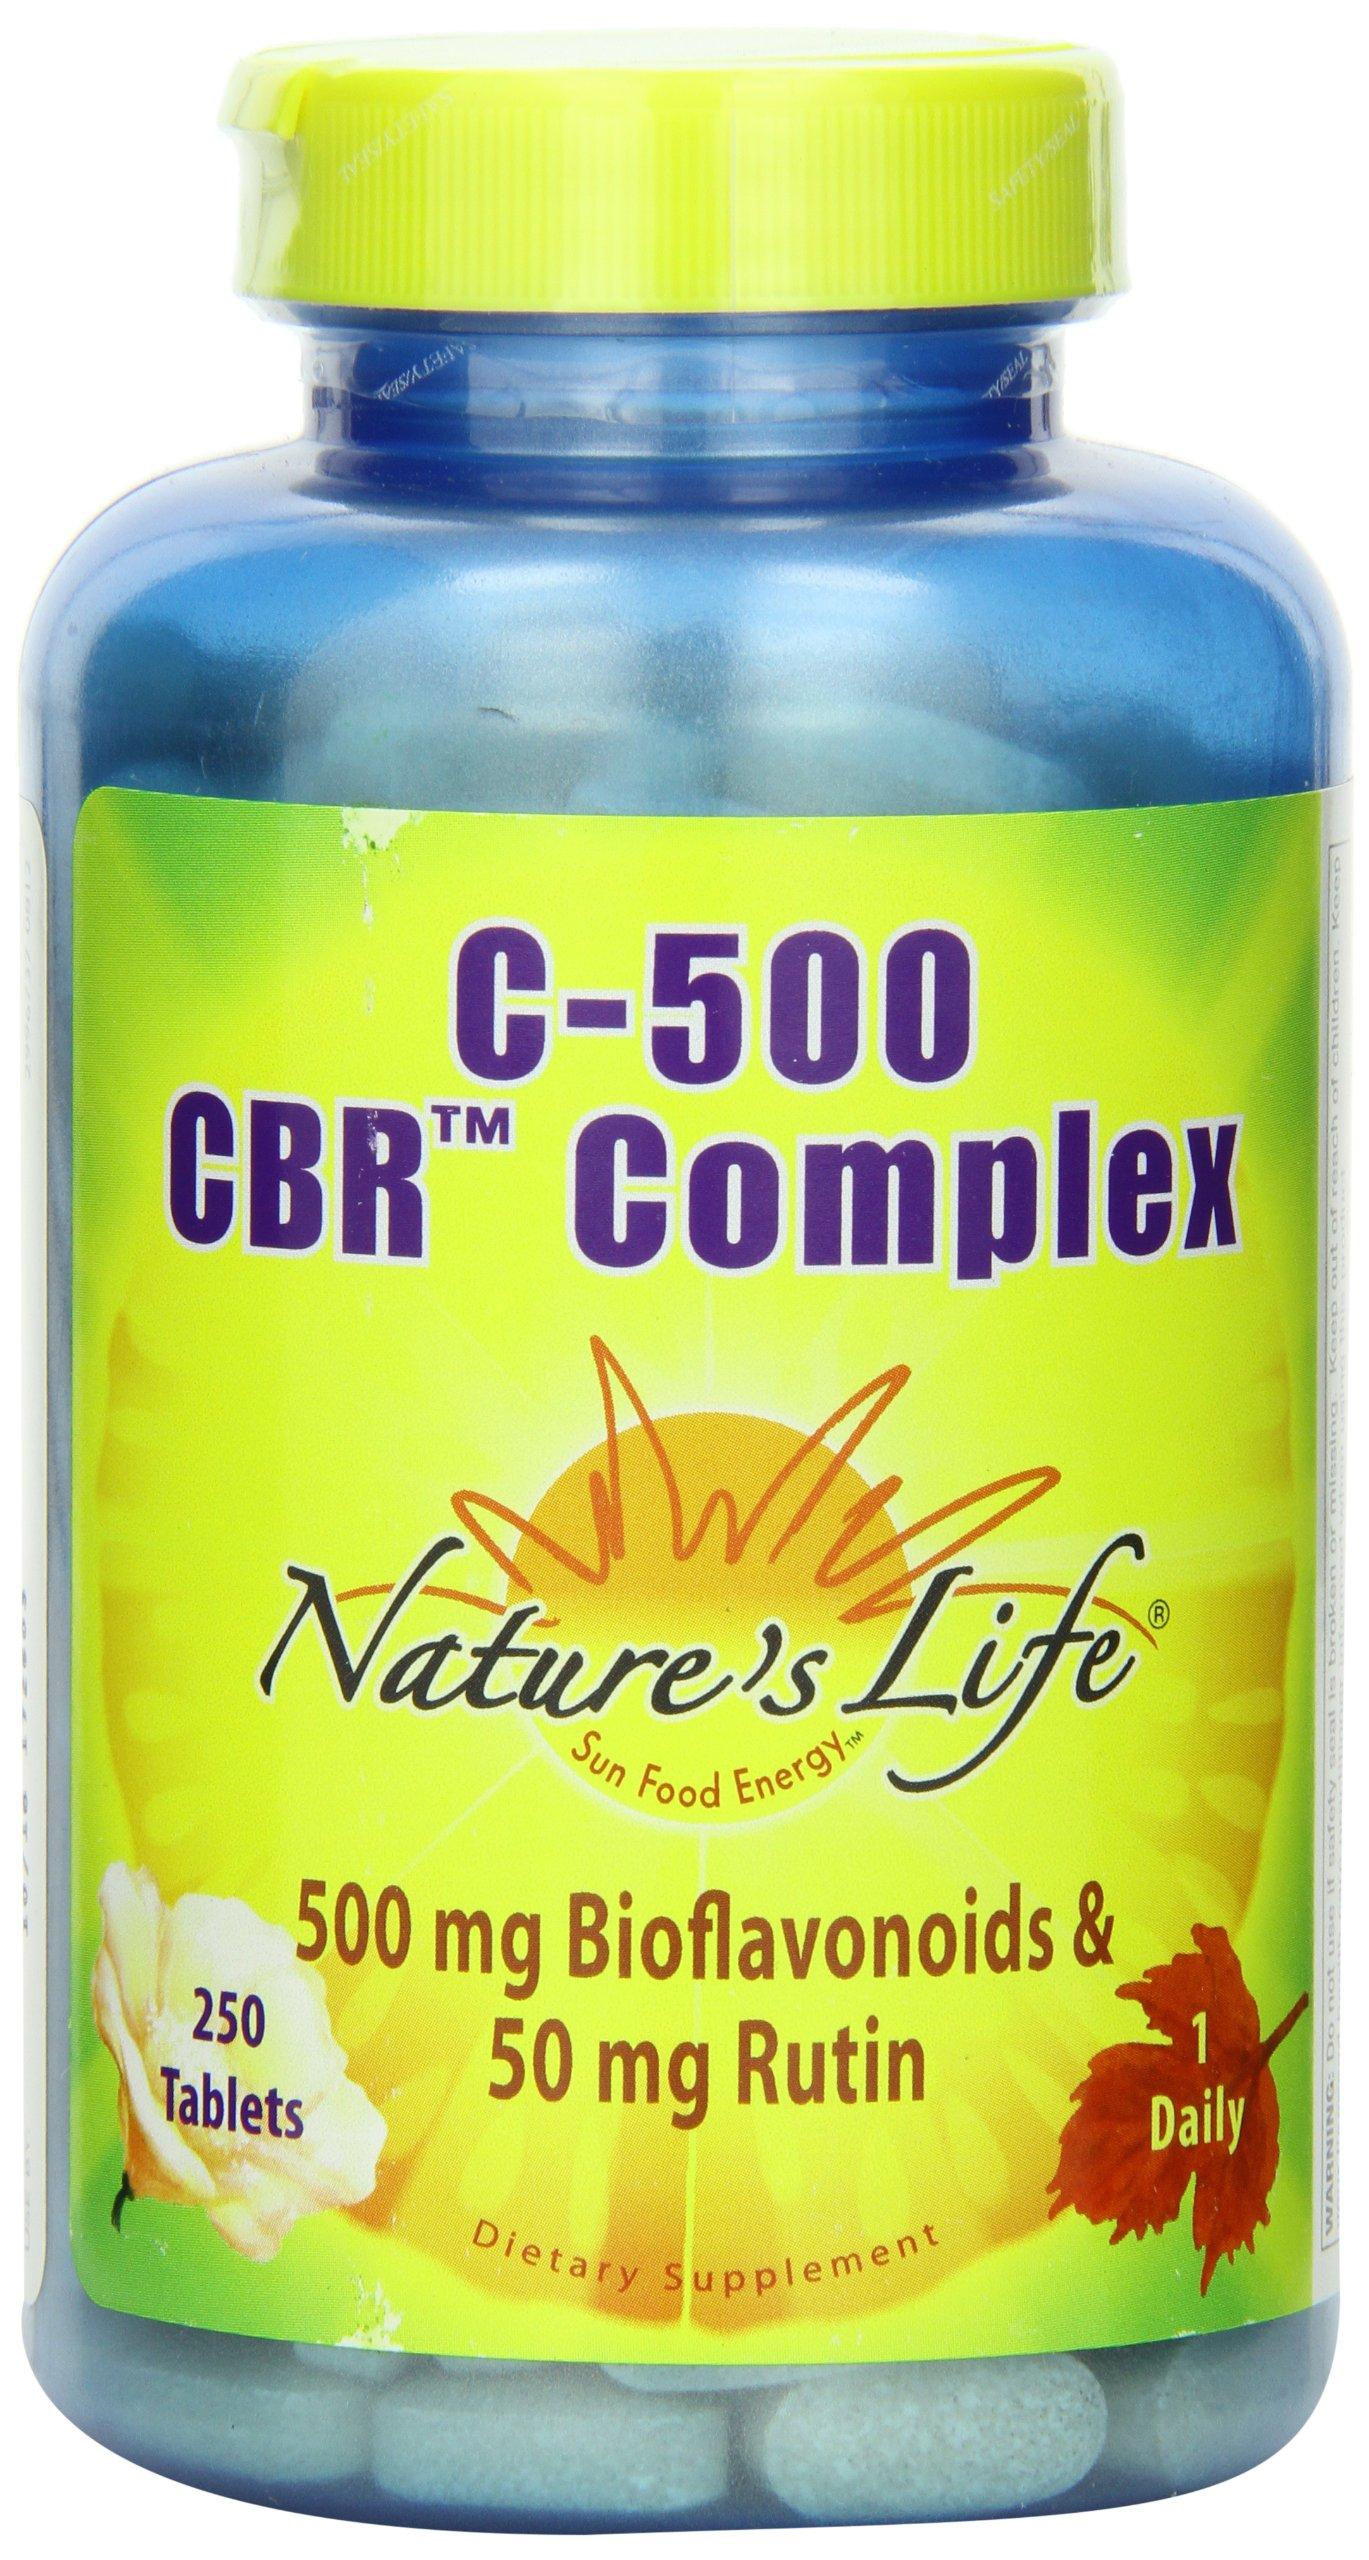 Nature's Life, C-500 CBR Complex, Bioflavonoids 500mg & Rutin 50mg Tablets, 250-Count